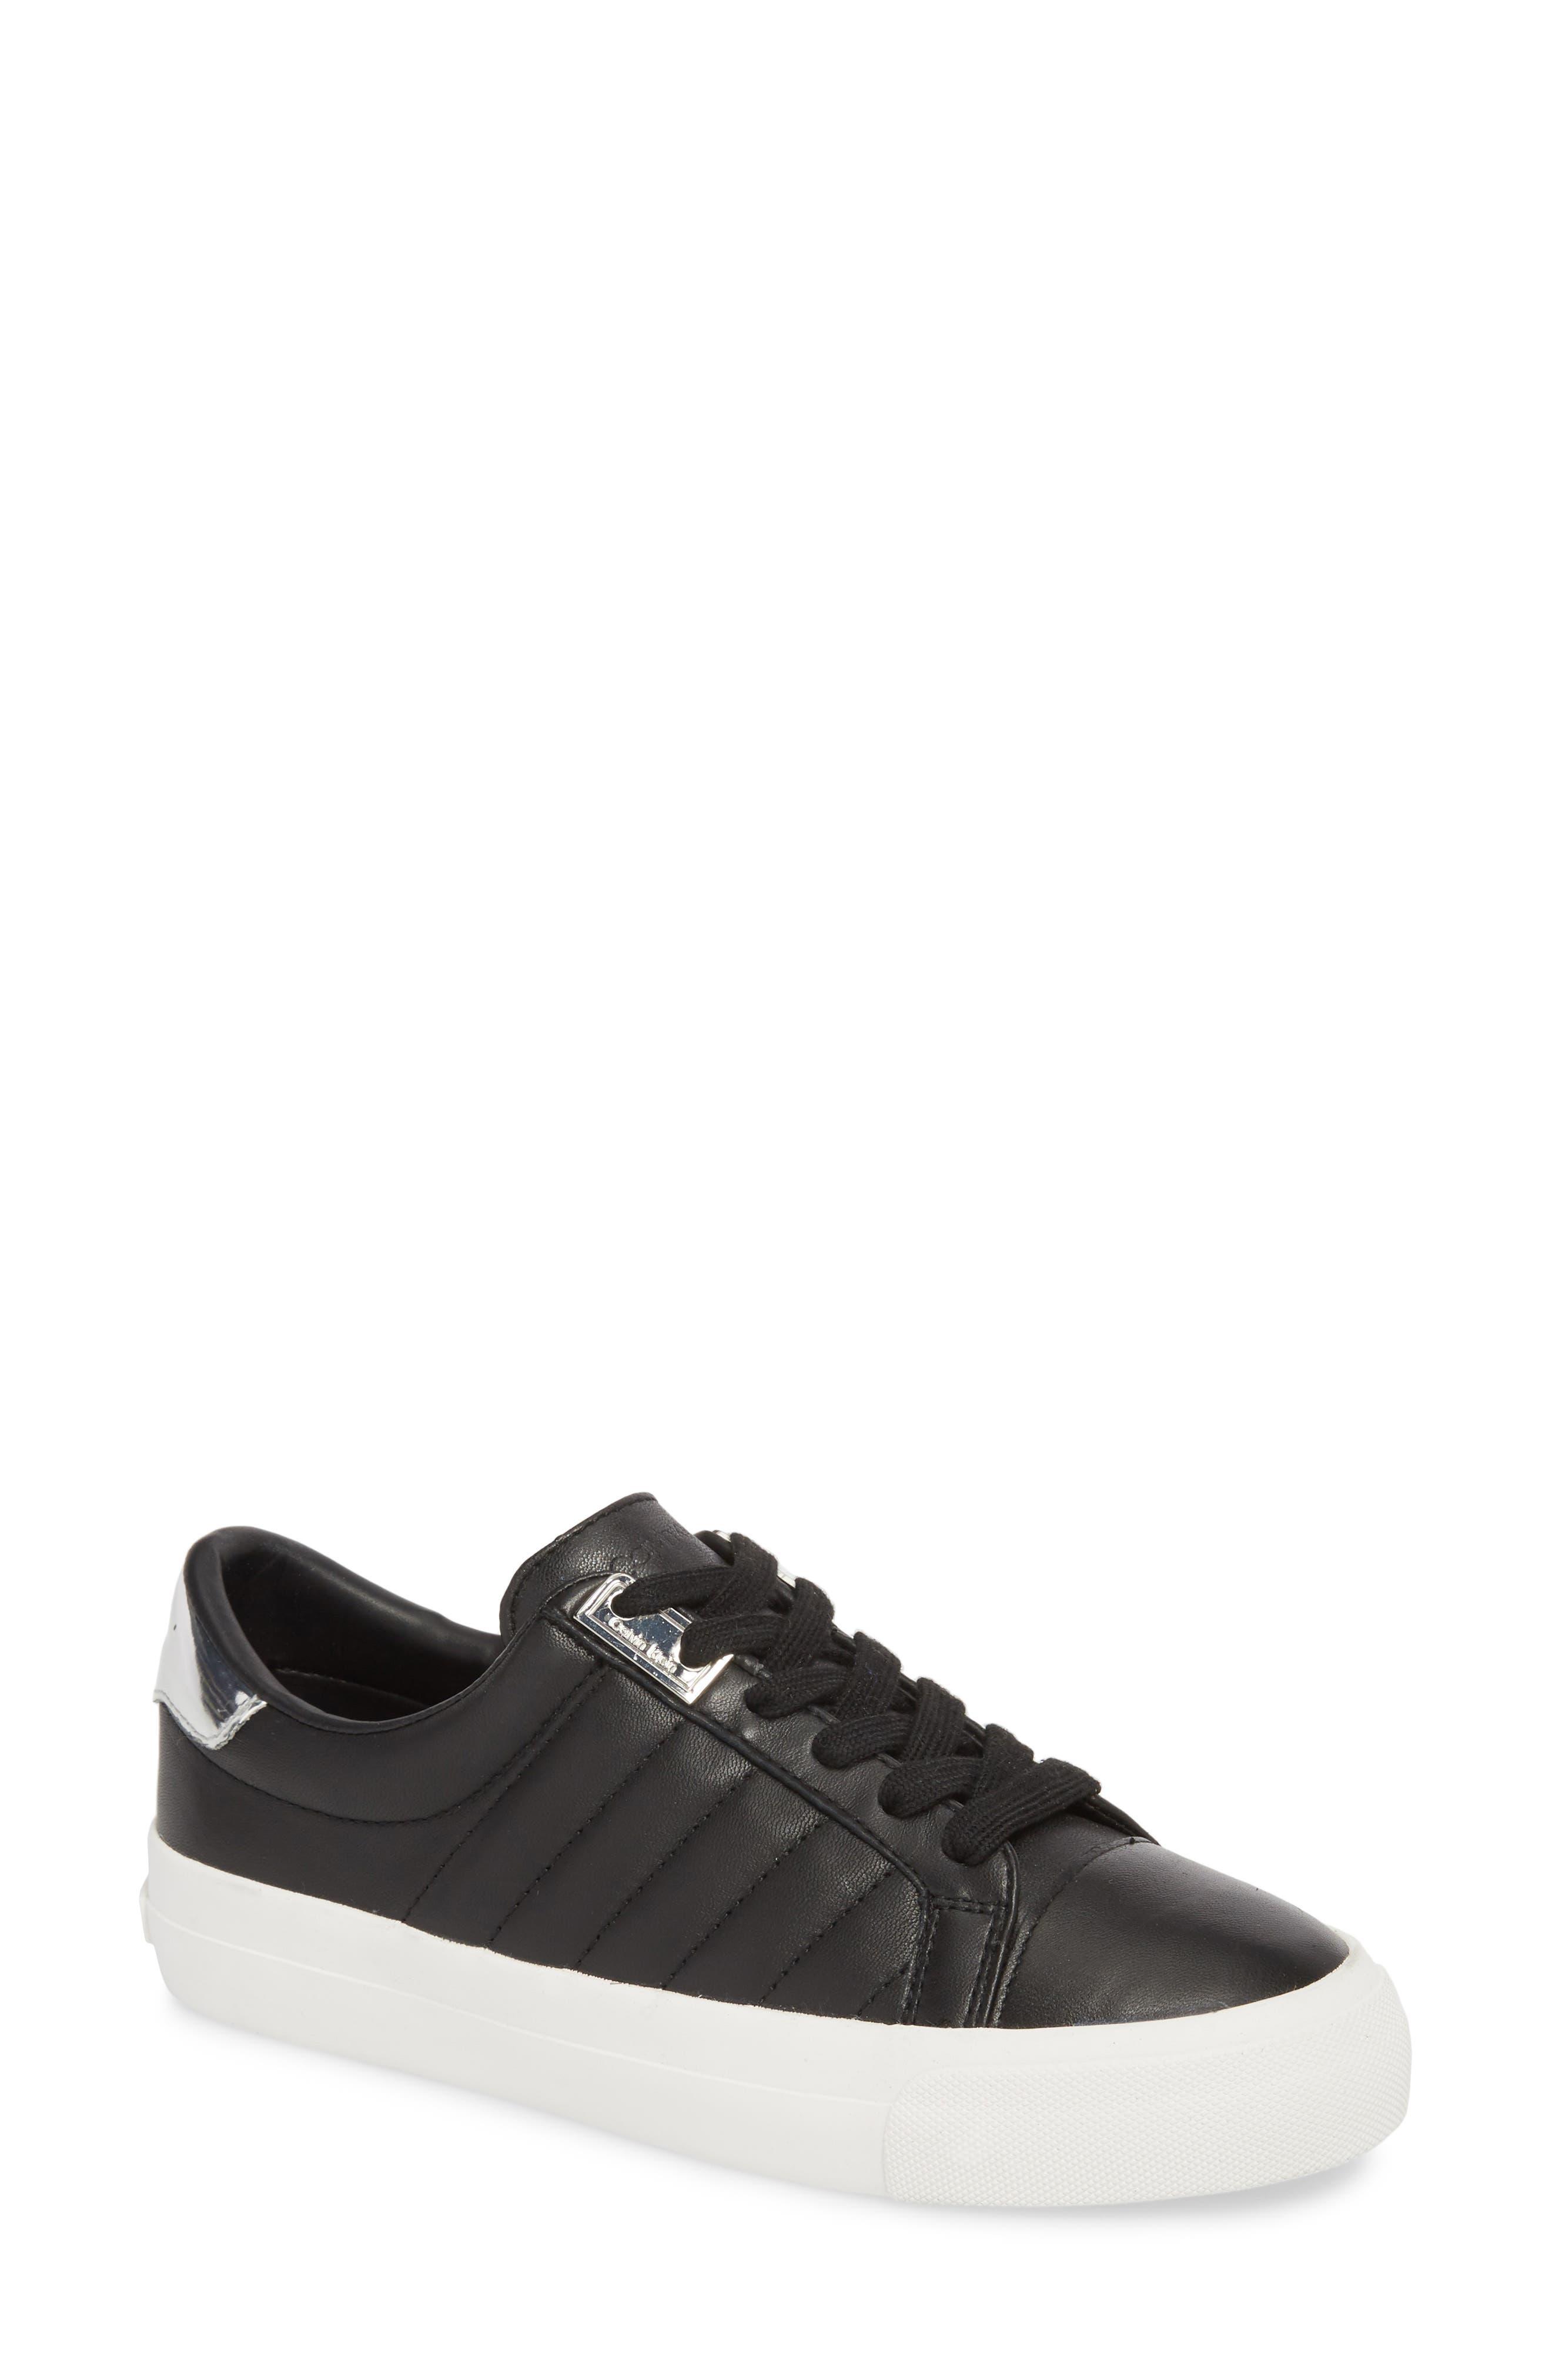 Vance Sneaker,                         Main,                         color, Black Leather